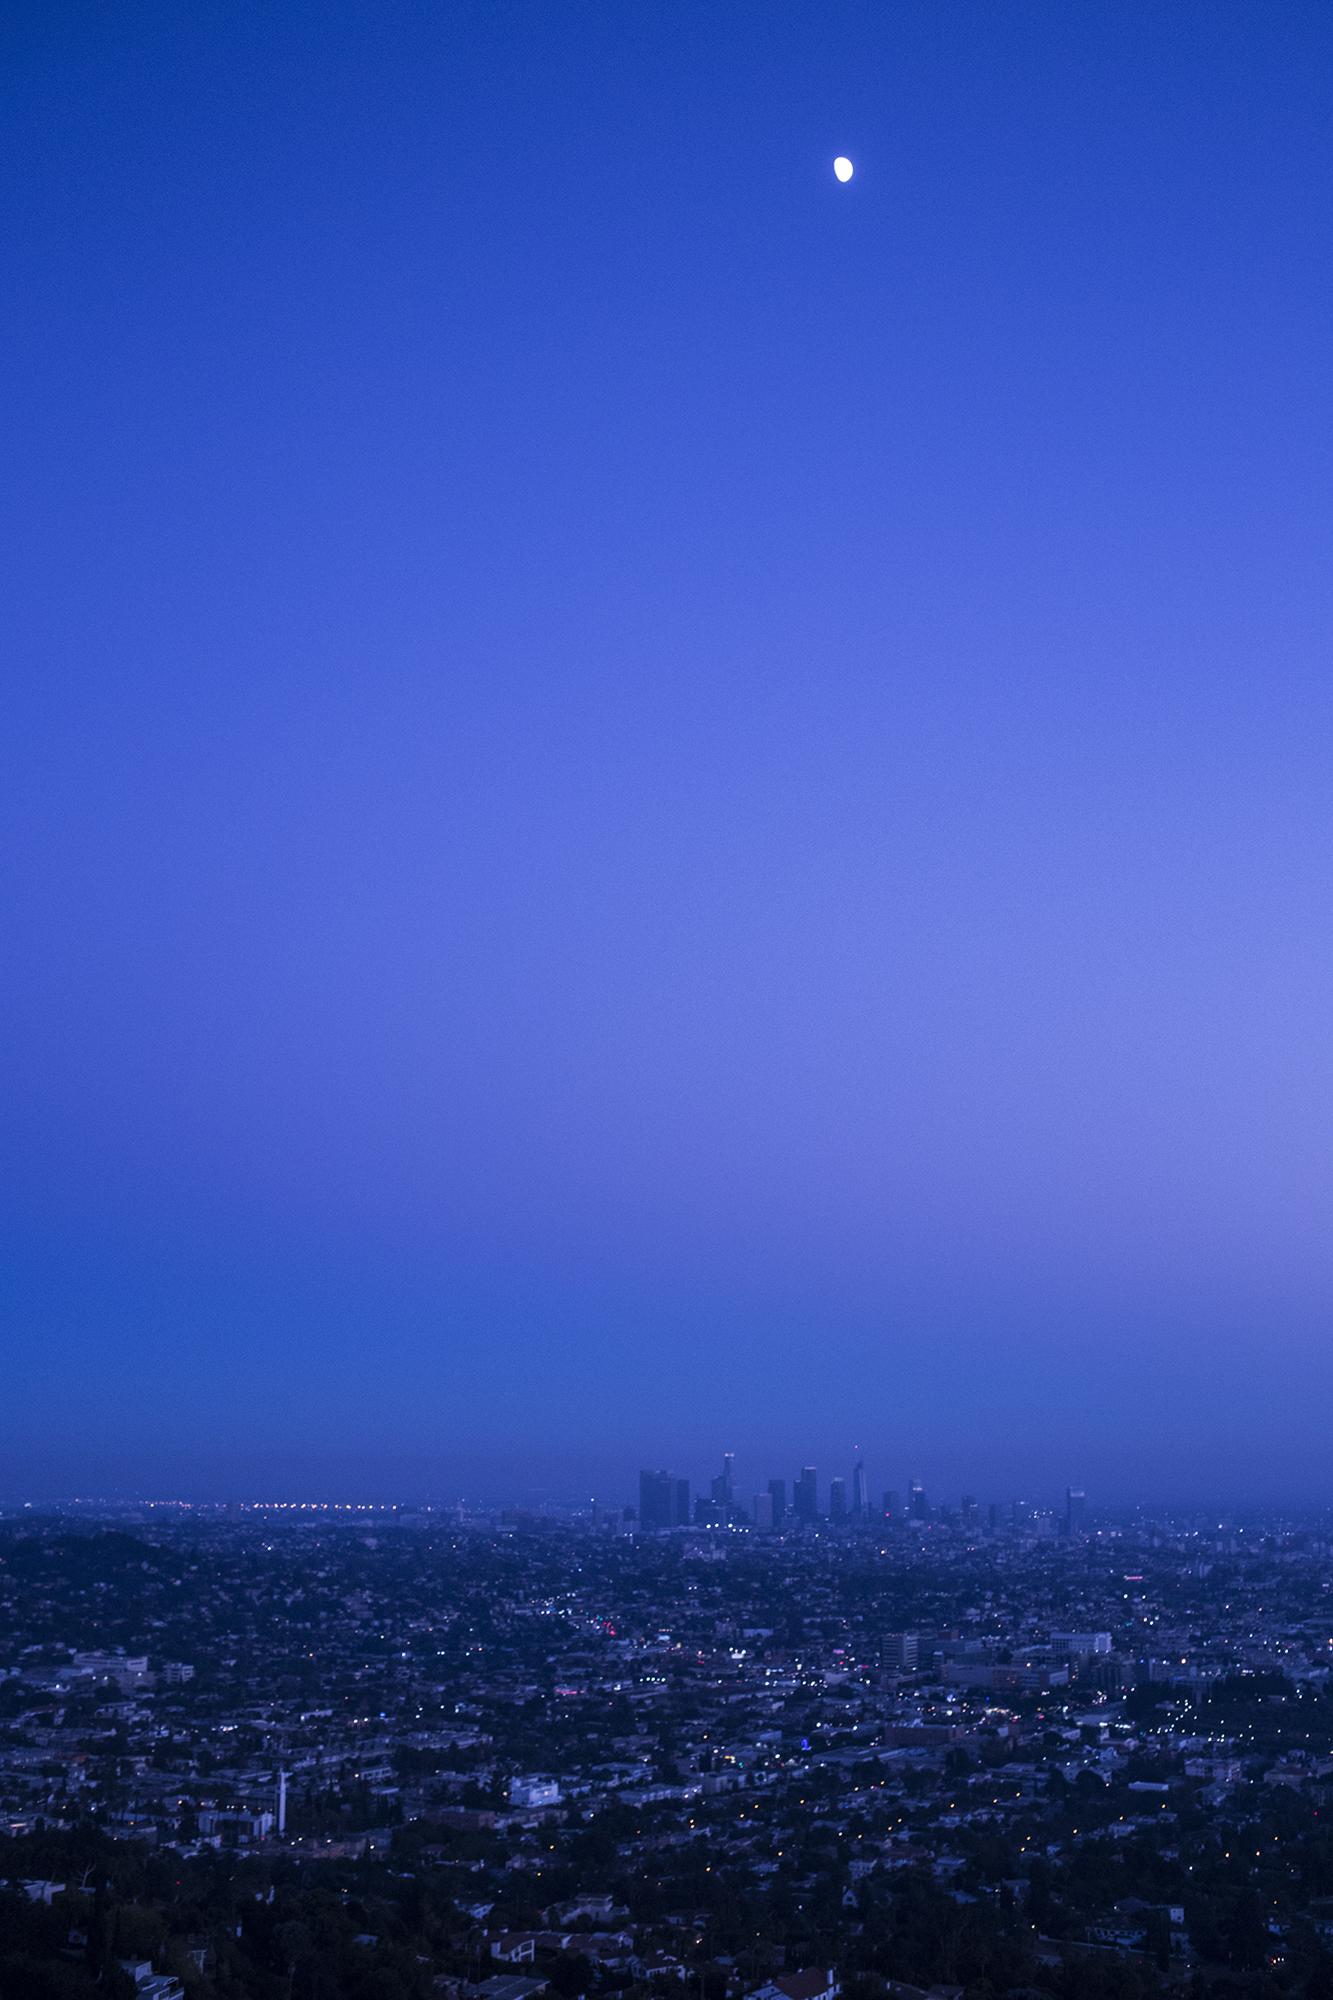 Moon Over LA by Rich J. Velasco